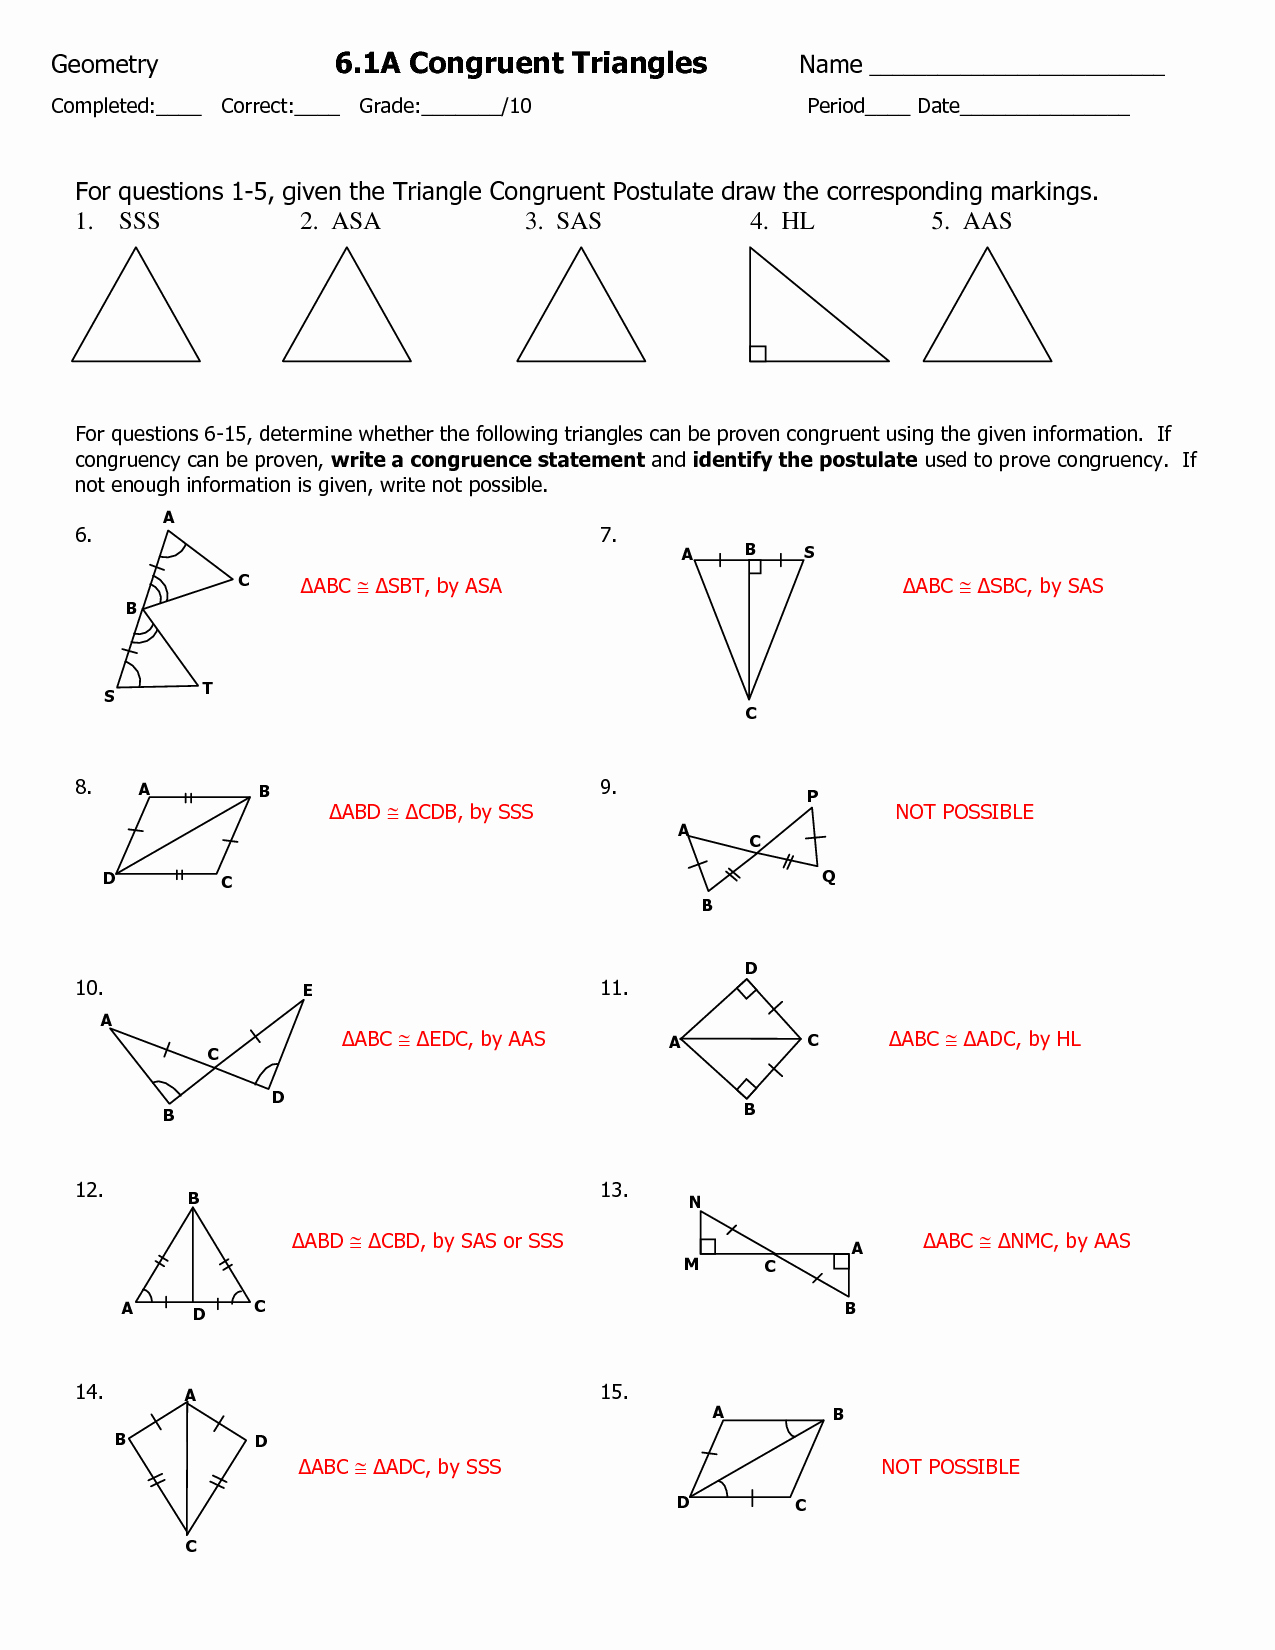 Triangle Congruence Worksheet Pdf Inspirational Triangle Congruence Worksheet Google Search